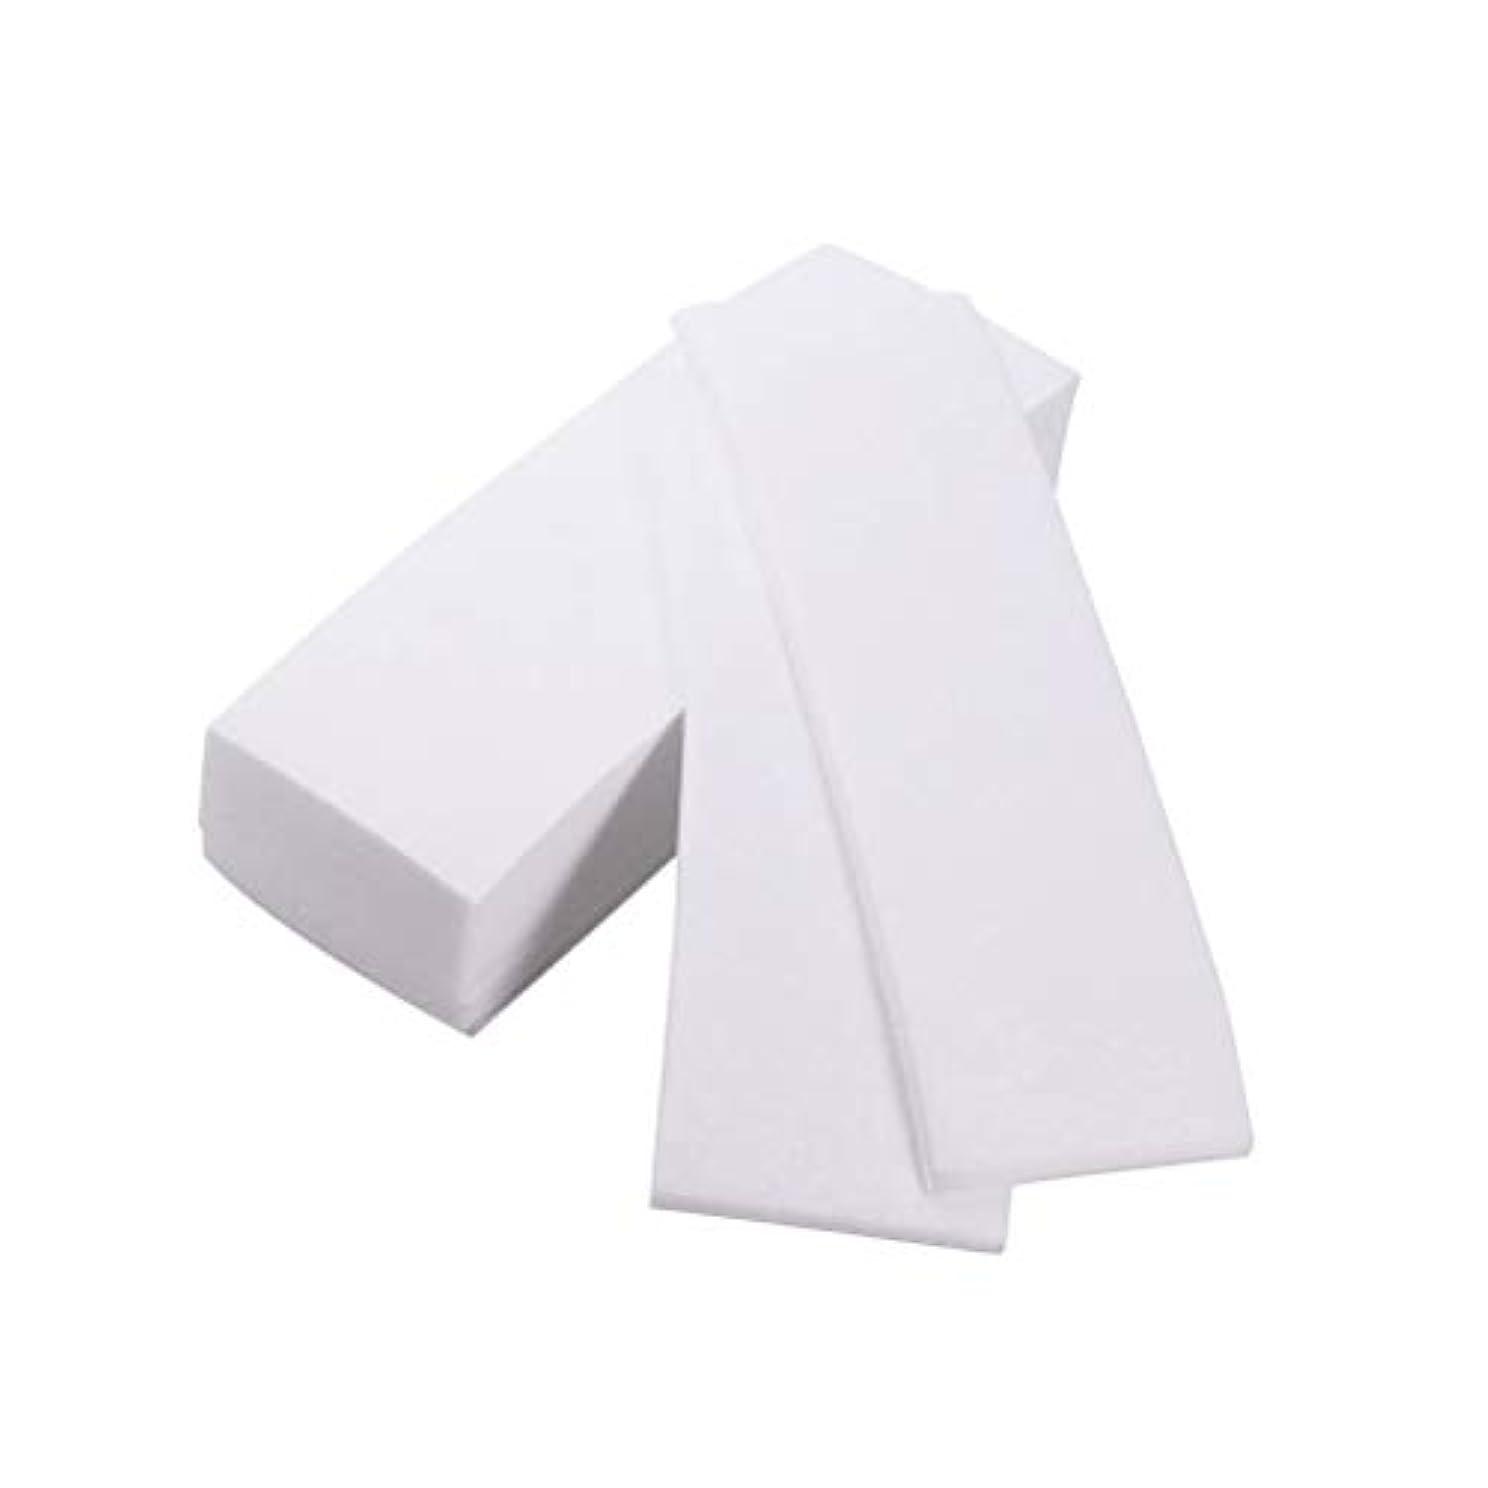 Healifty ヘアリムーバーツール300ピースプロフェッショナルフェイシャルボディ脱毛ワックスストリップ紙脱毛不織布脱毛器